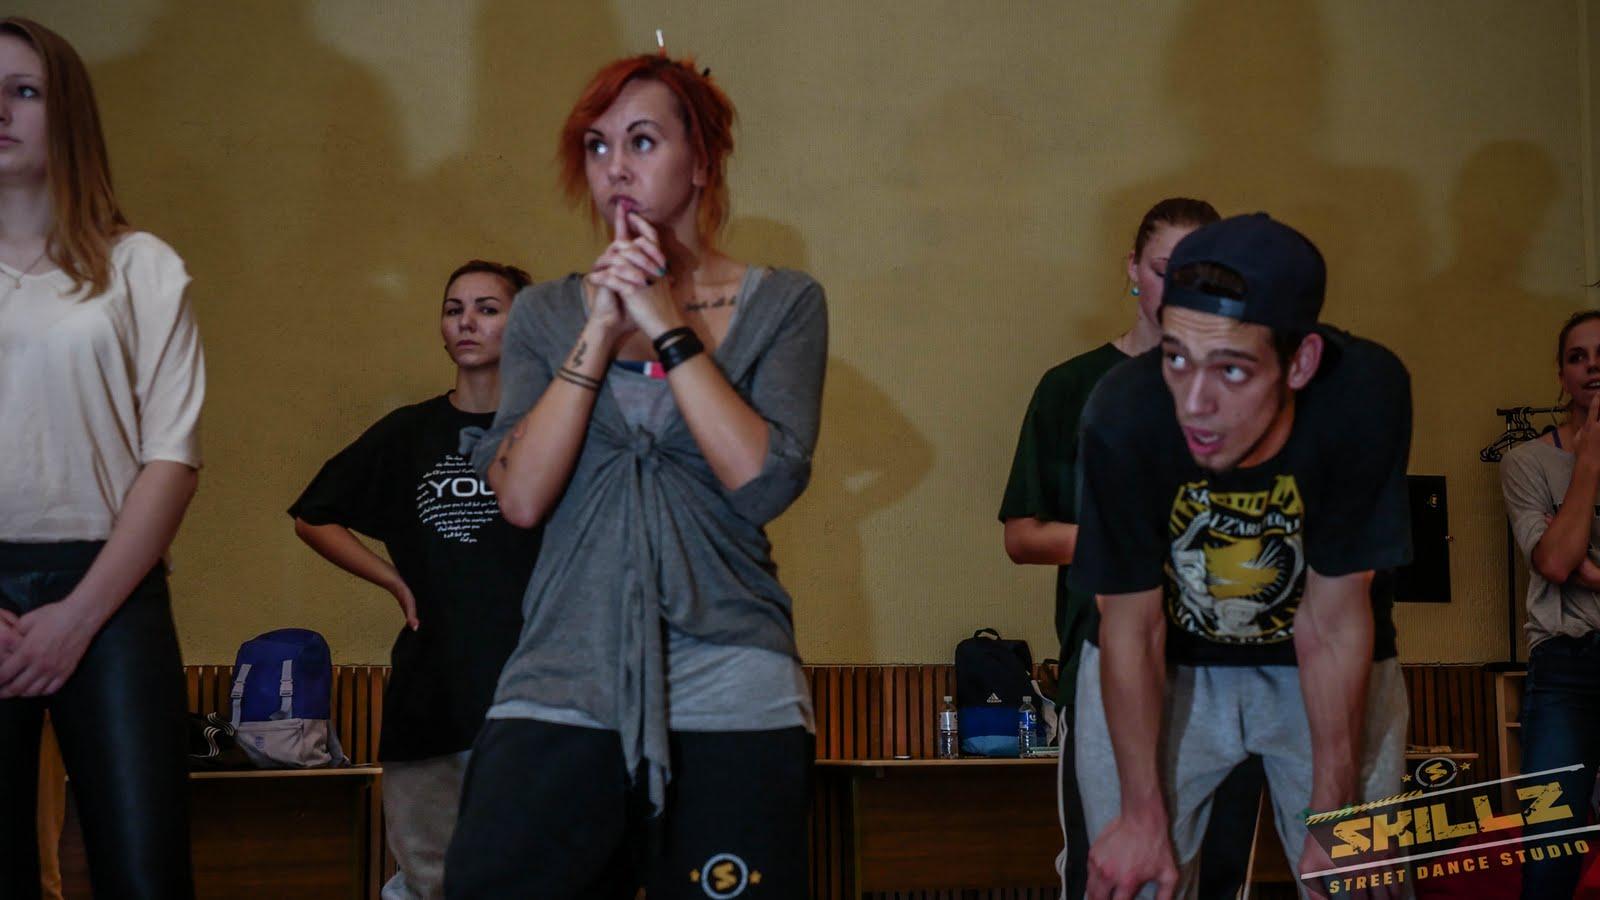 Hip Hop seminaras su Rochka (Paryzius) - P1050692.jpg